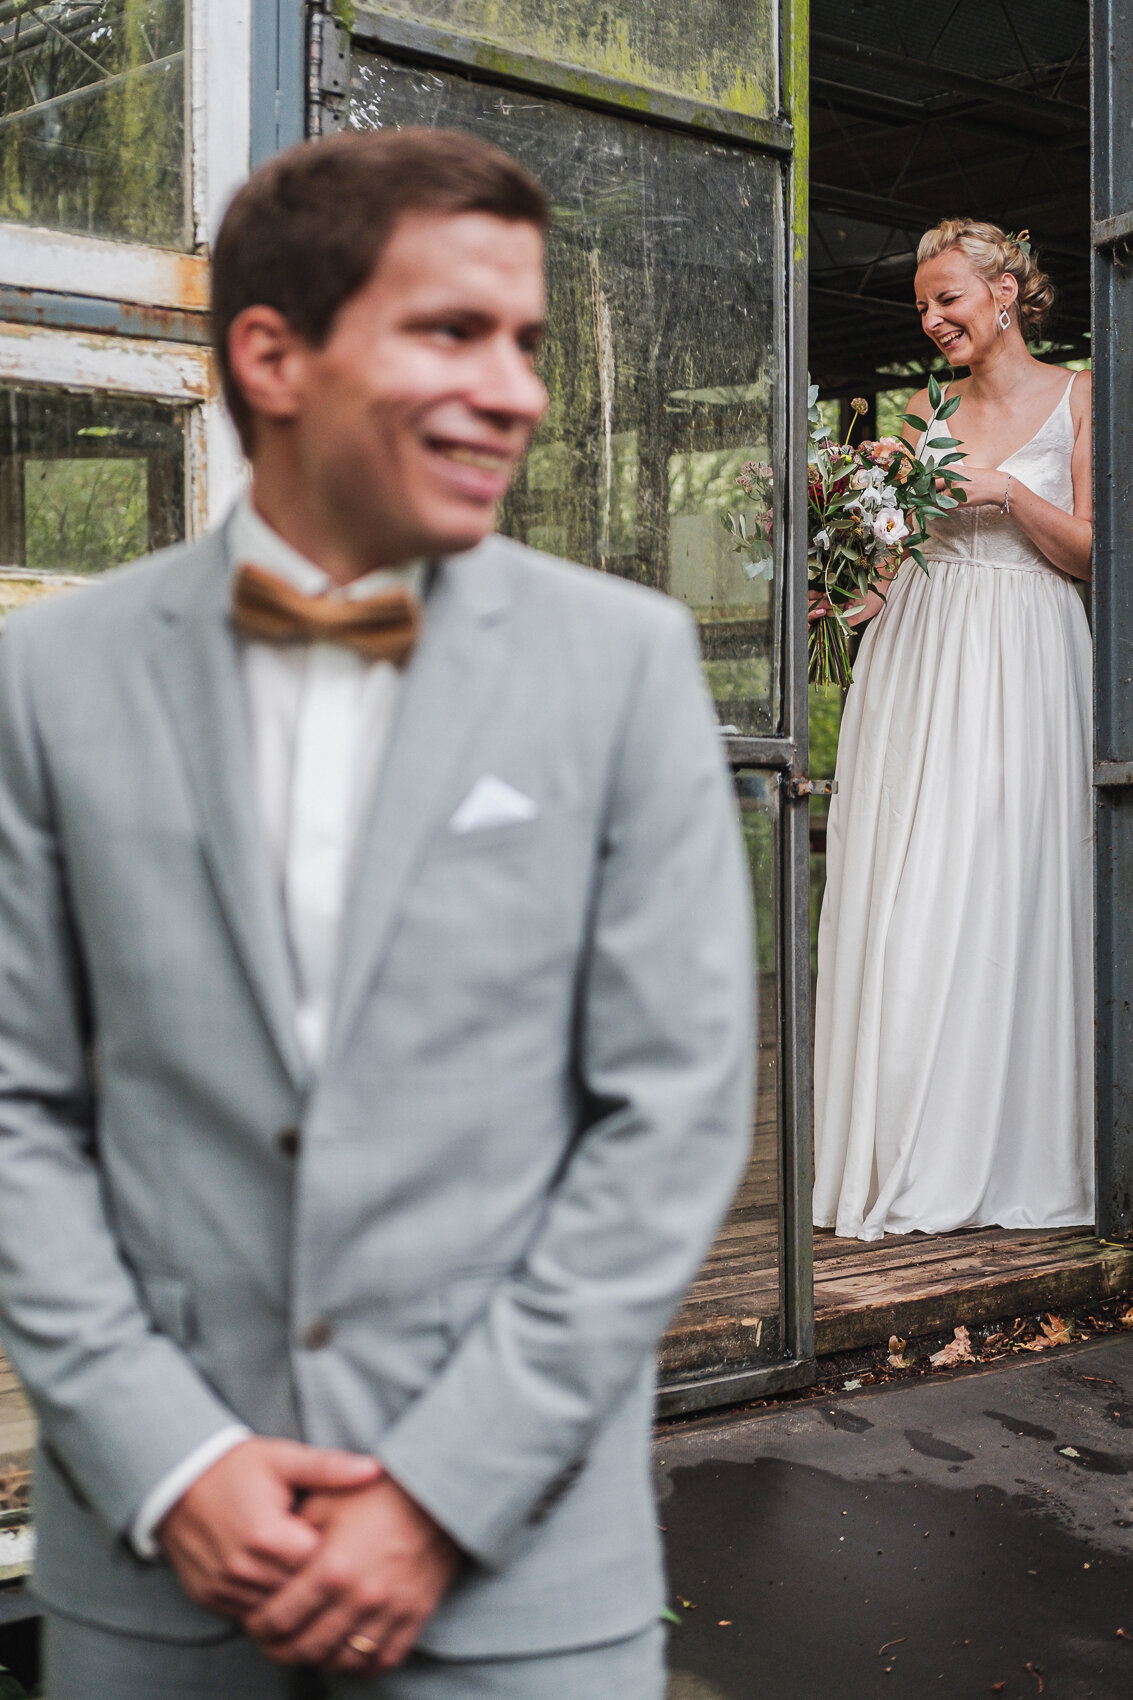 iso800 - huwelijksfotograaf isabo matthias verbeke foundation-12.jpg